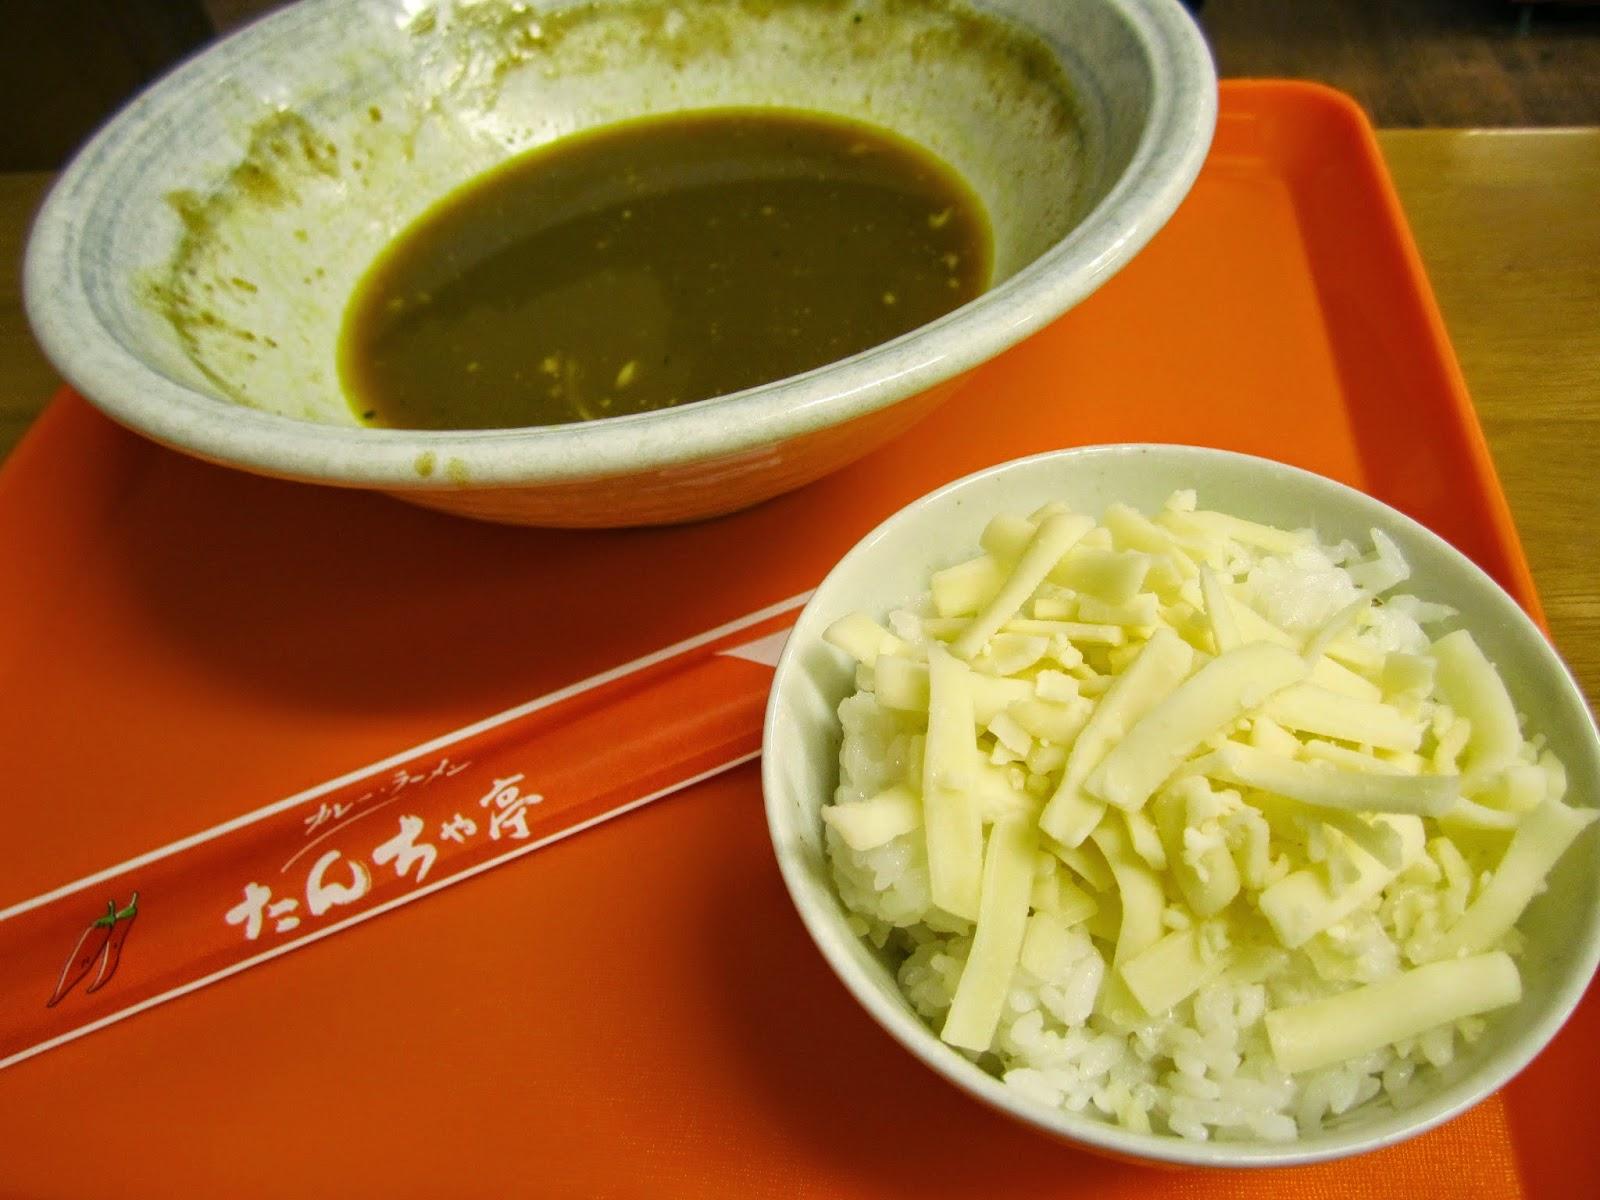 Curry Noodles Rice & Cheese Tanchatei Towada カレーヌードル ライスとチーズ たんちゃ亭 十和田市